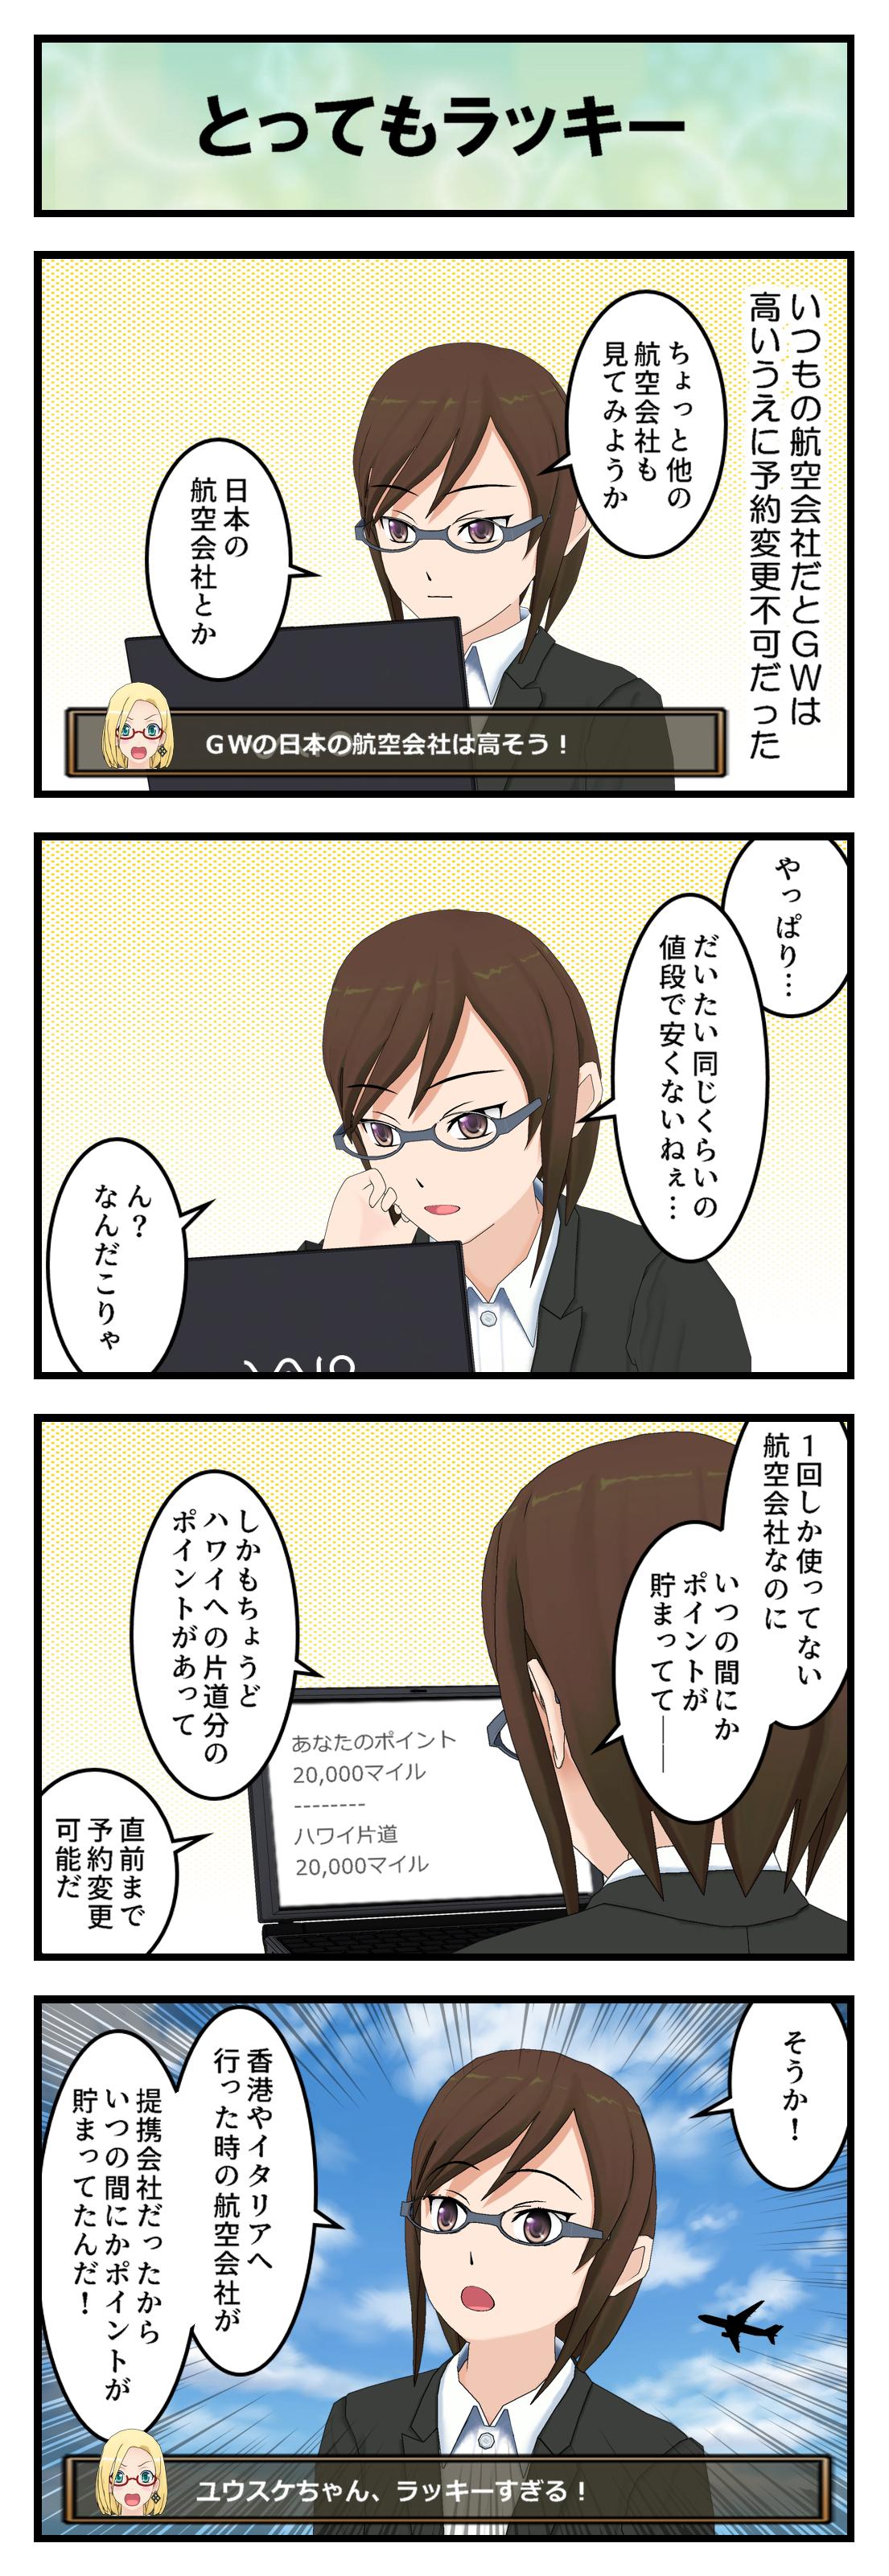 Q166_飛行機調べ中JAL_001